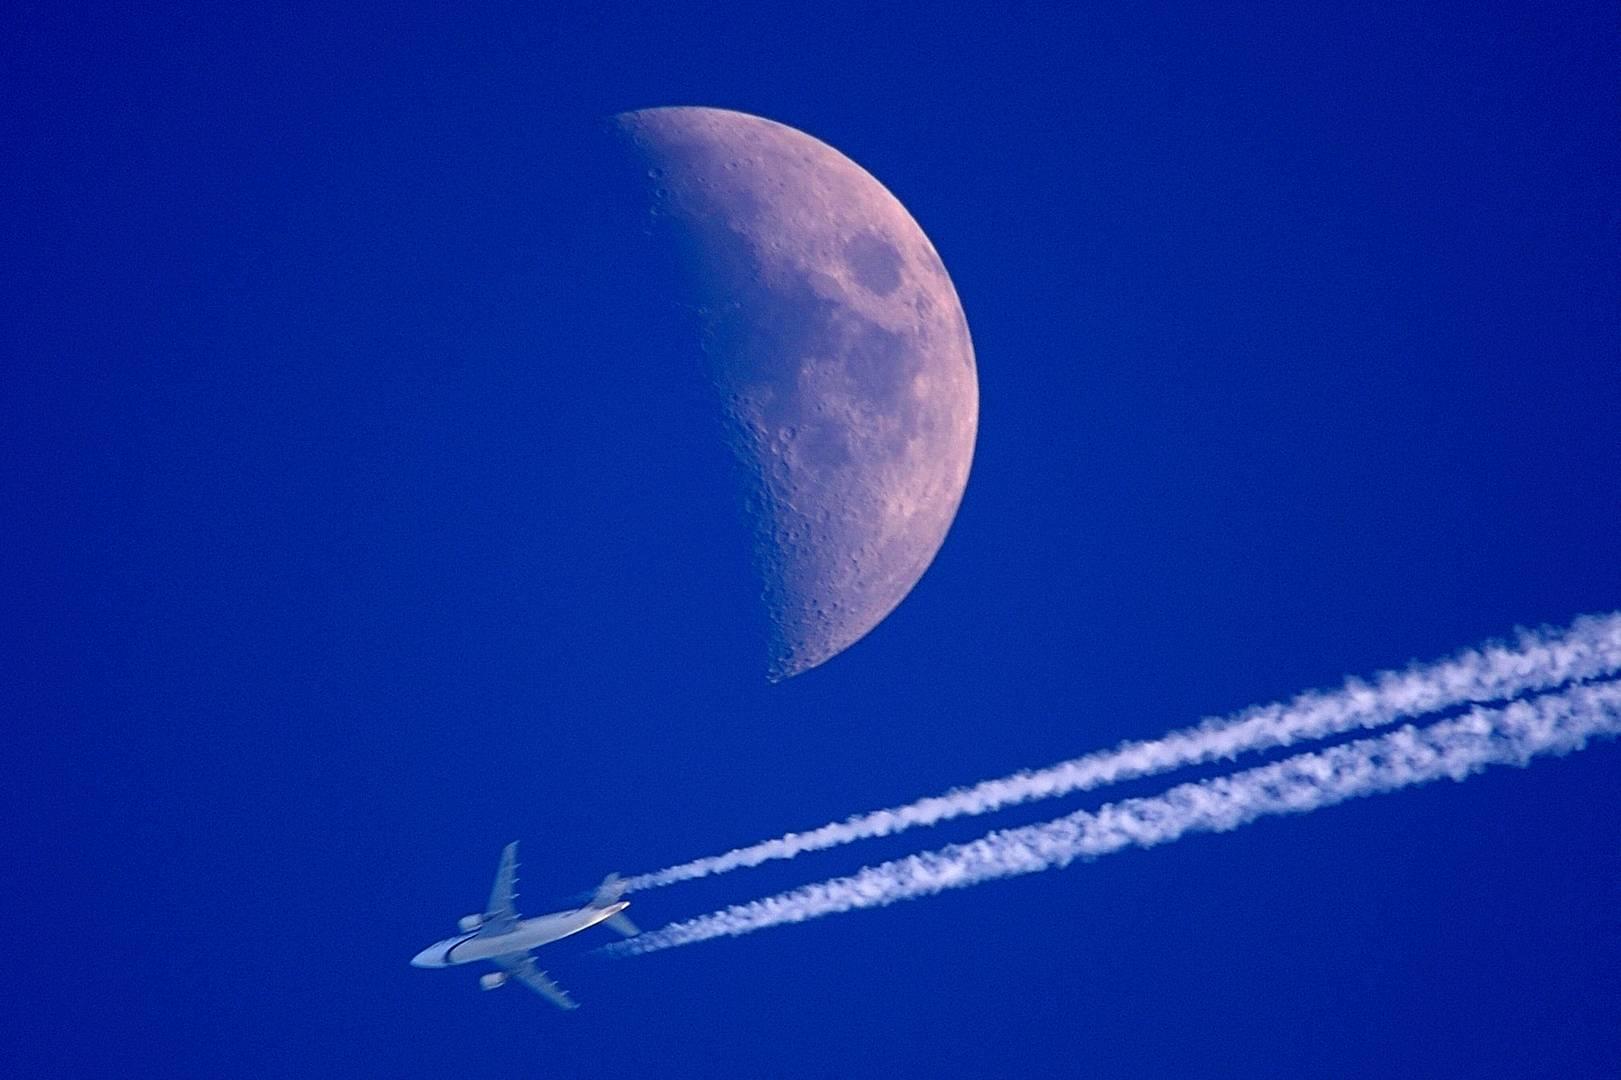 Flug am Mond vorbei